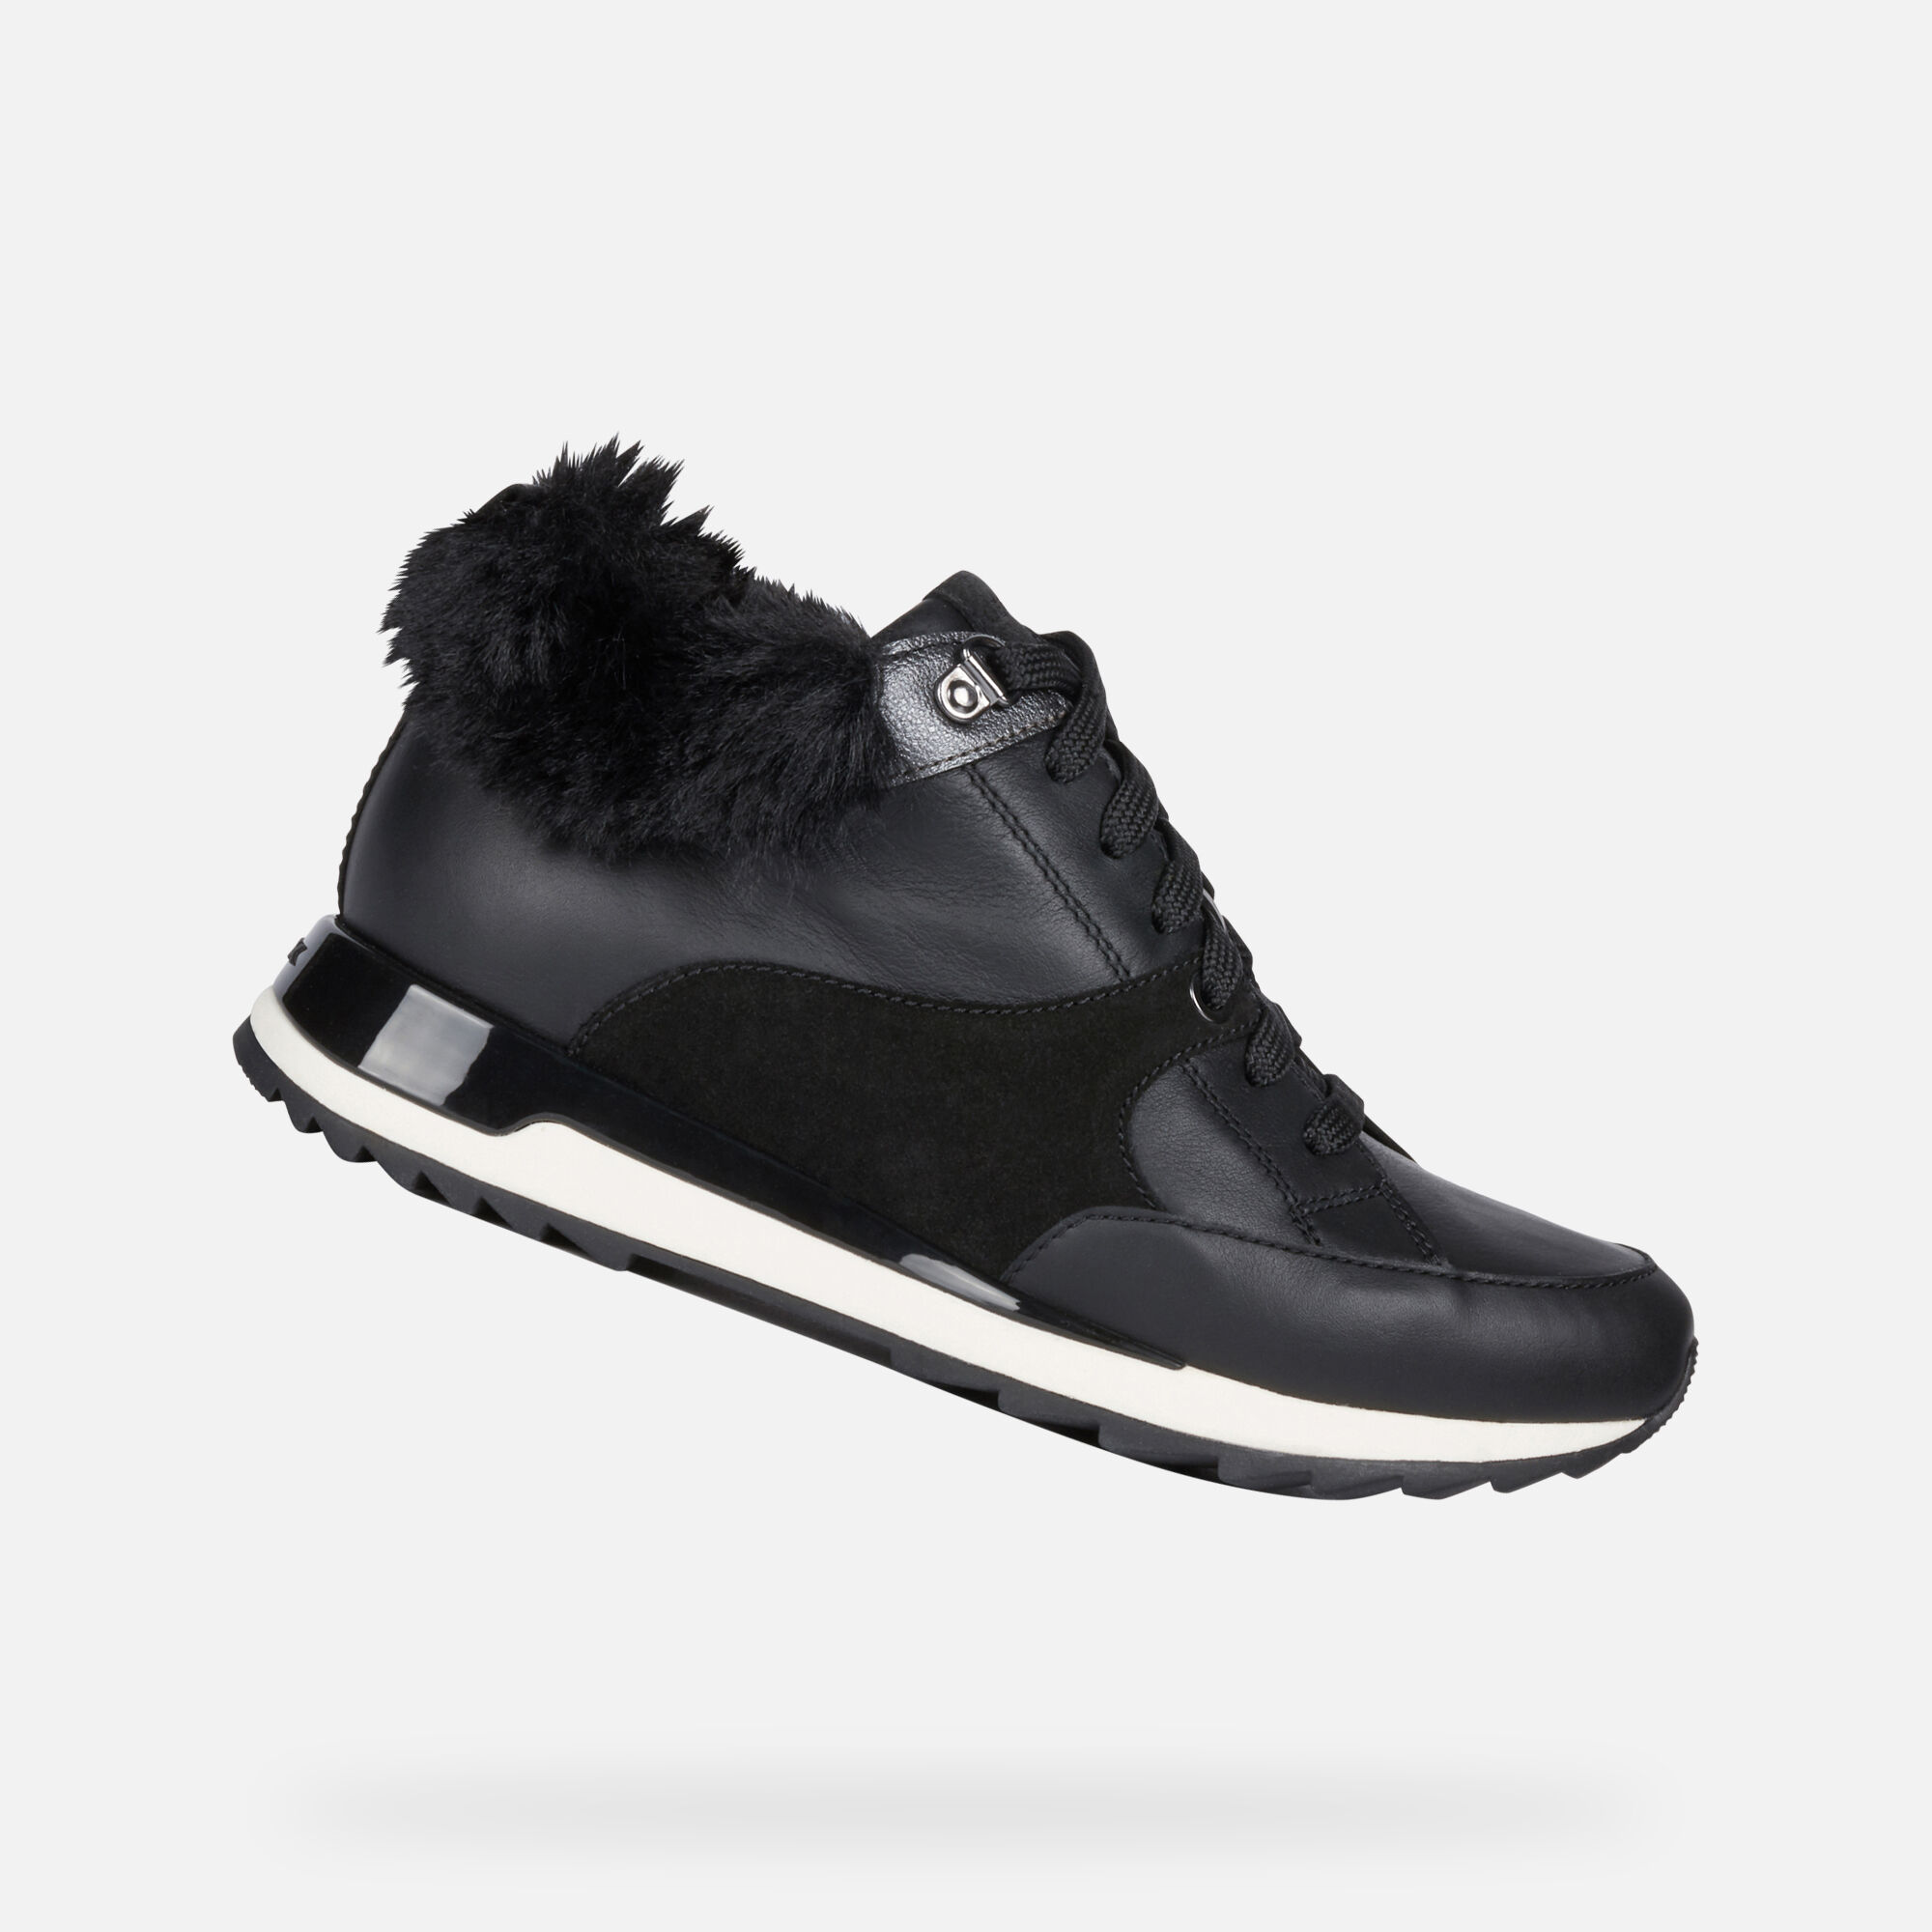 Geox ANEKO B ABX Frau: schwarze Sneakers High | Geox FW1920